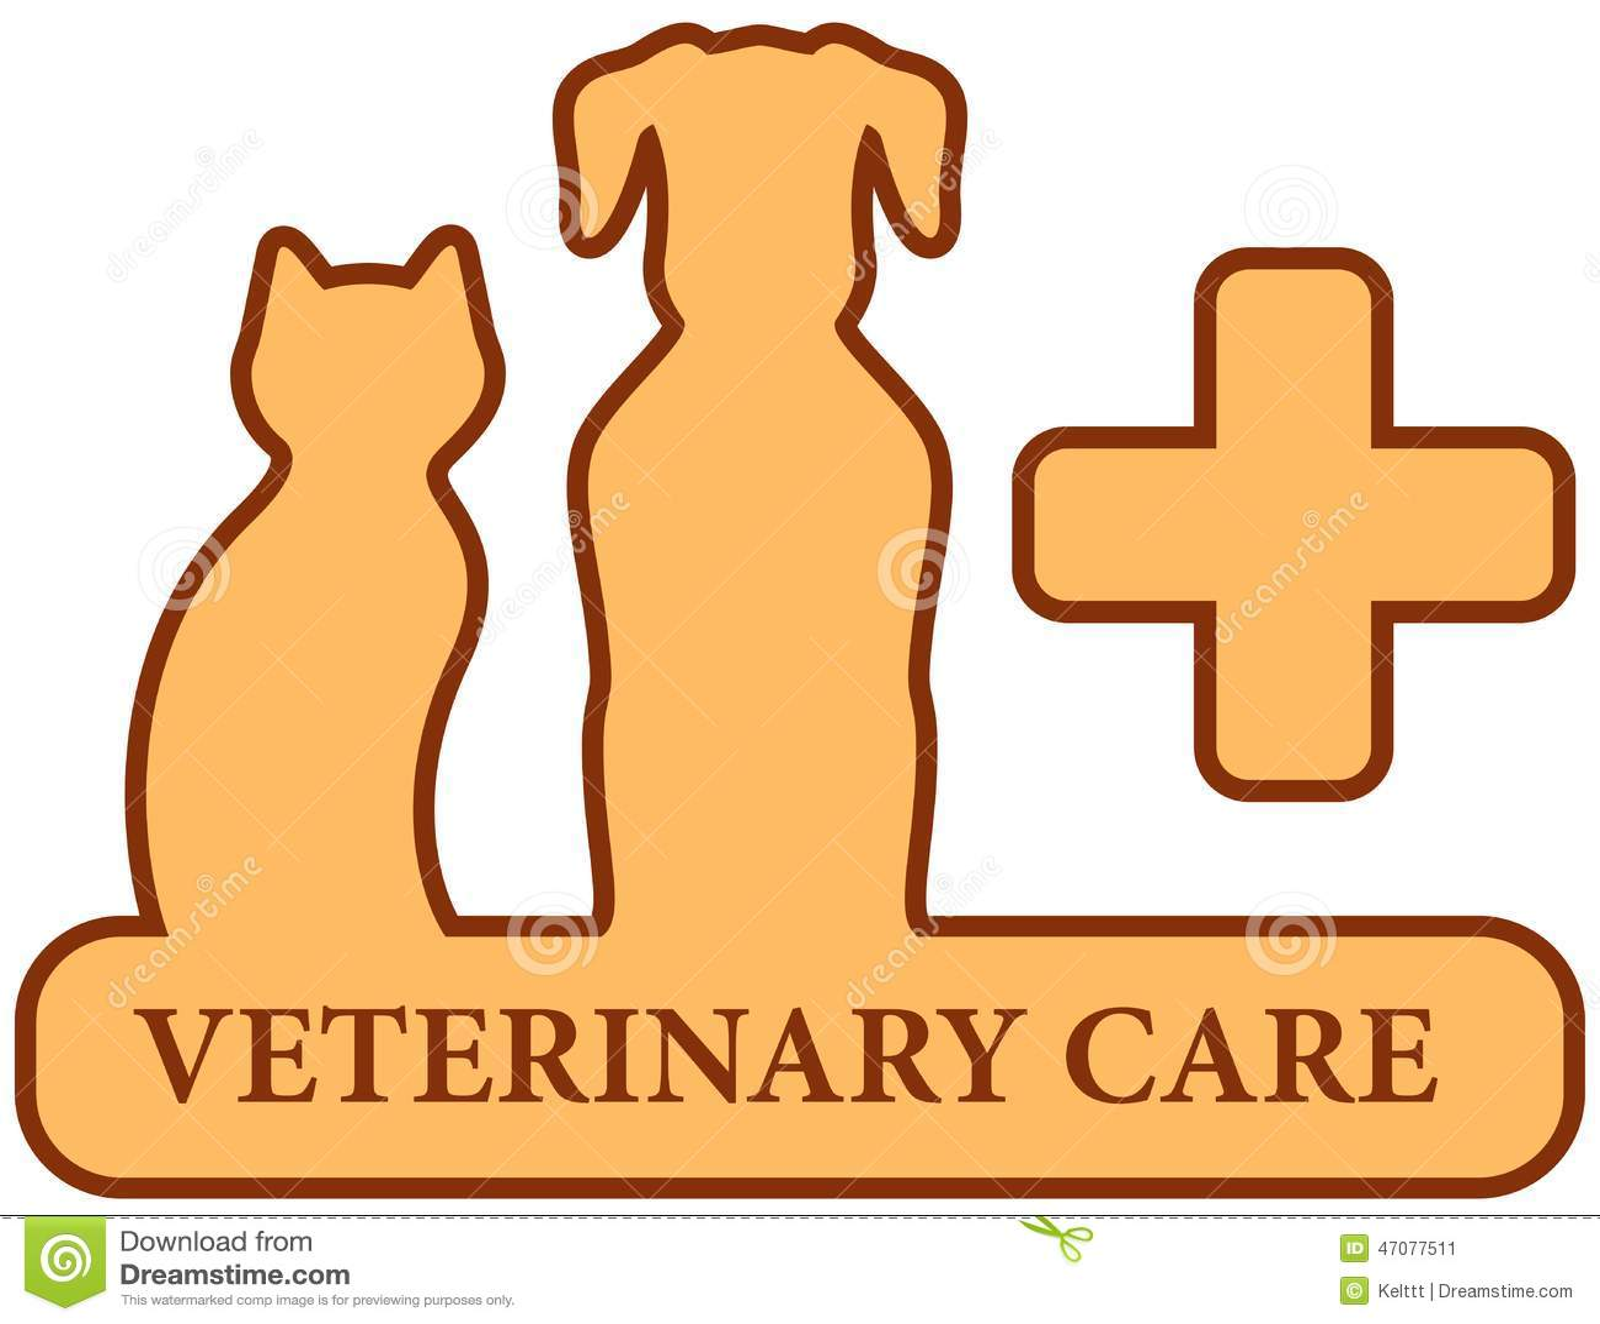 Veterinary Medicine hardest business majors